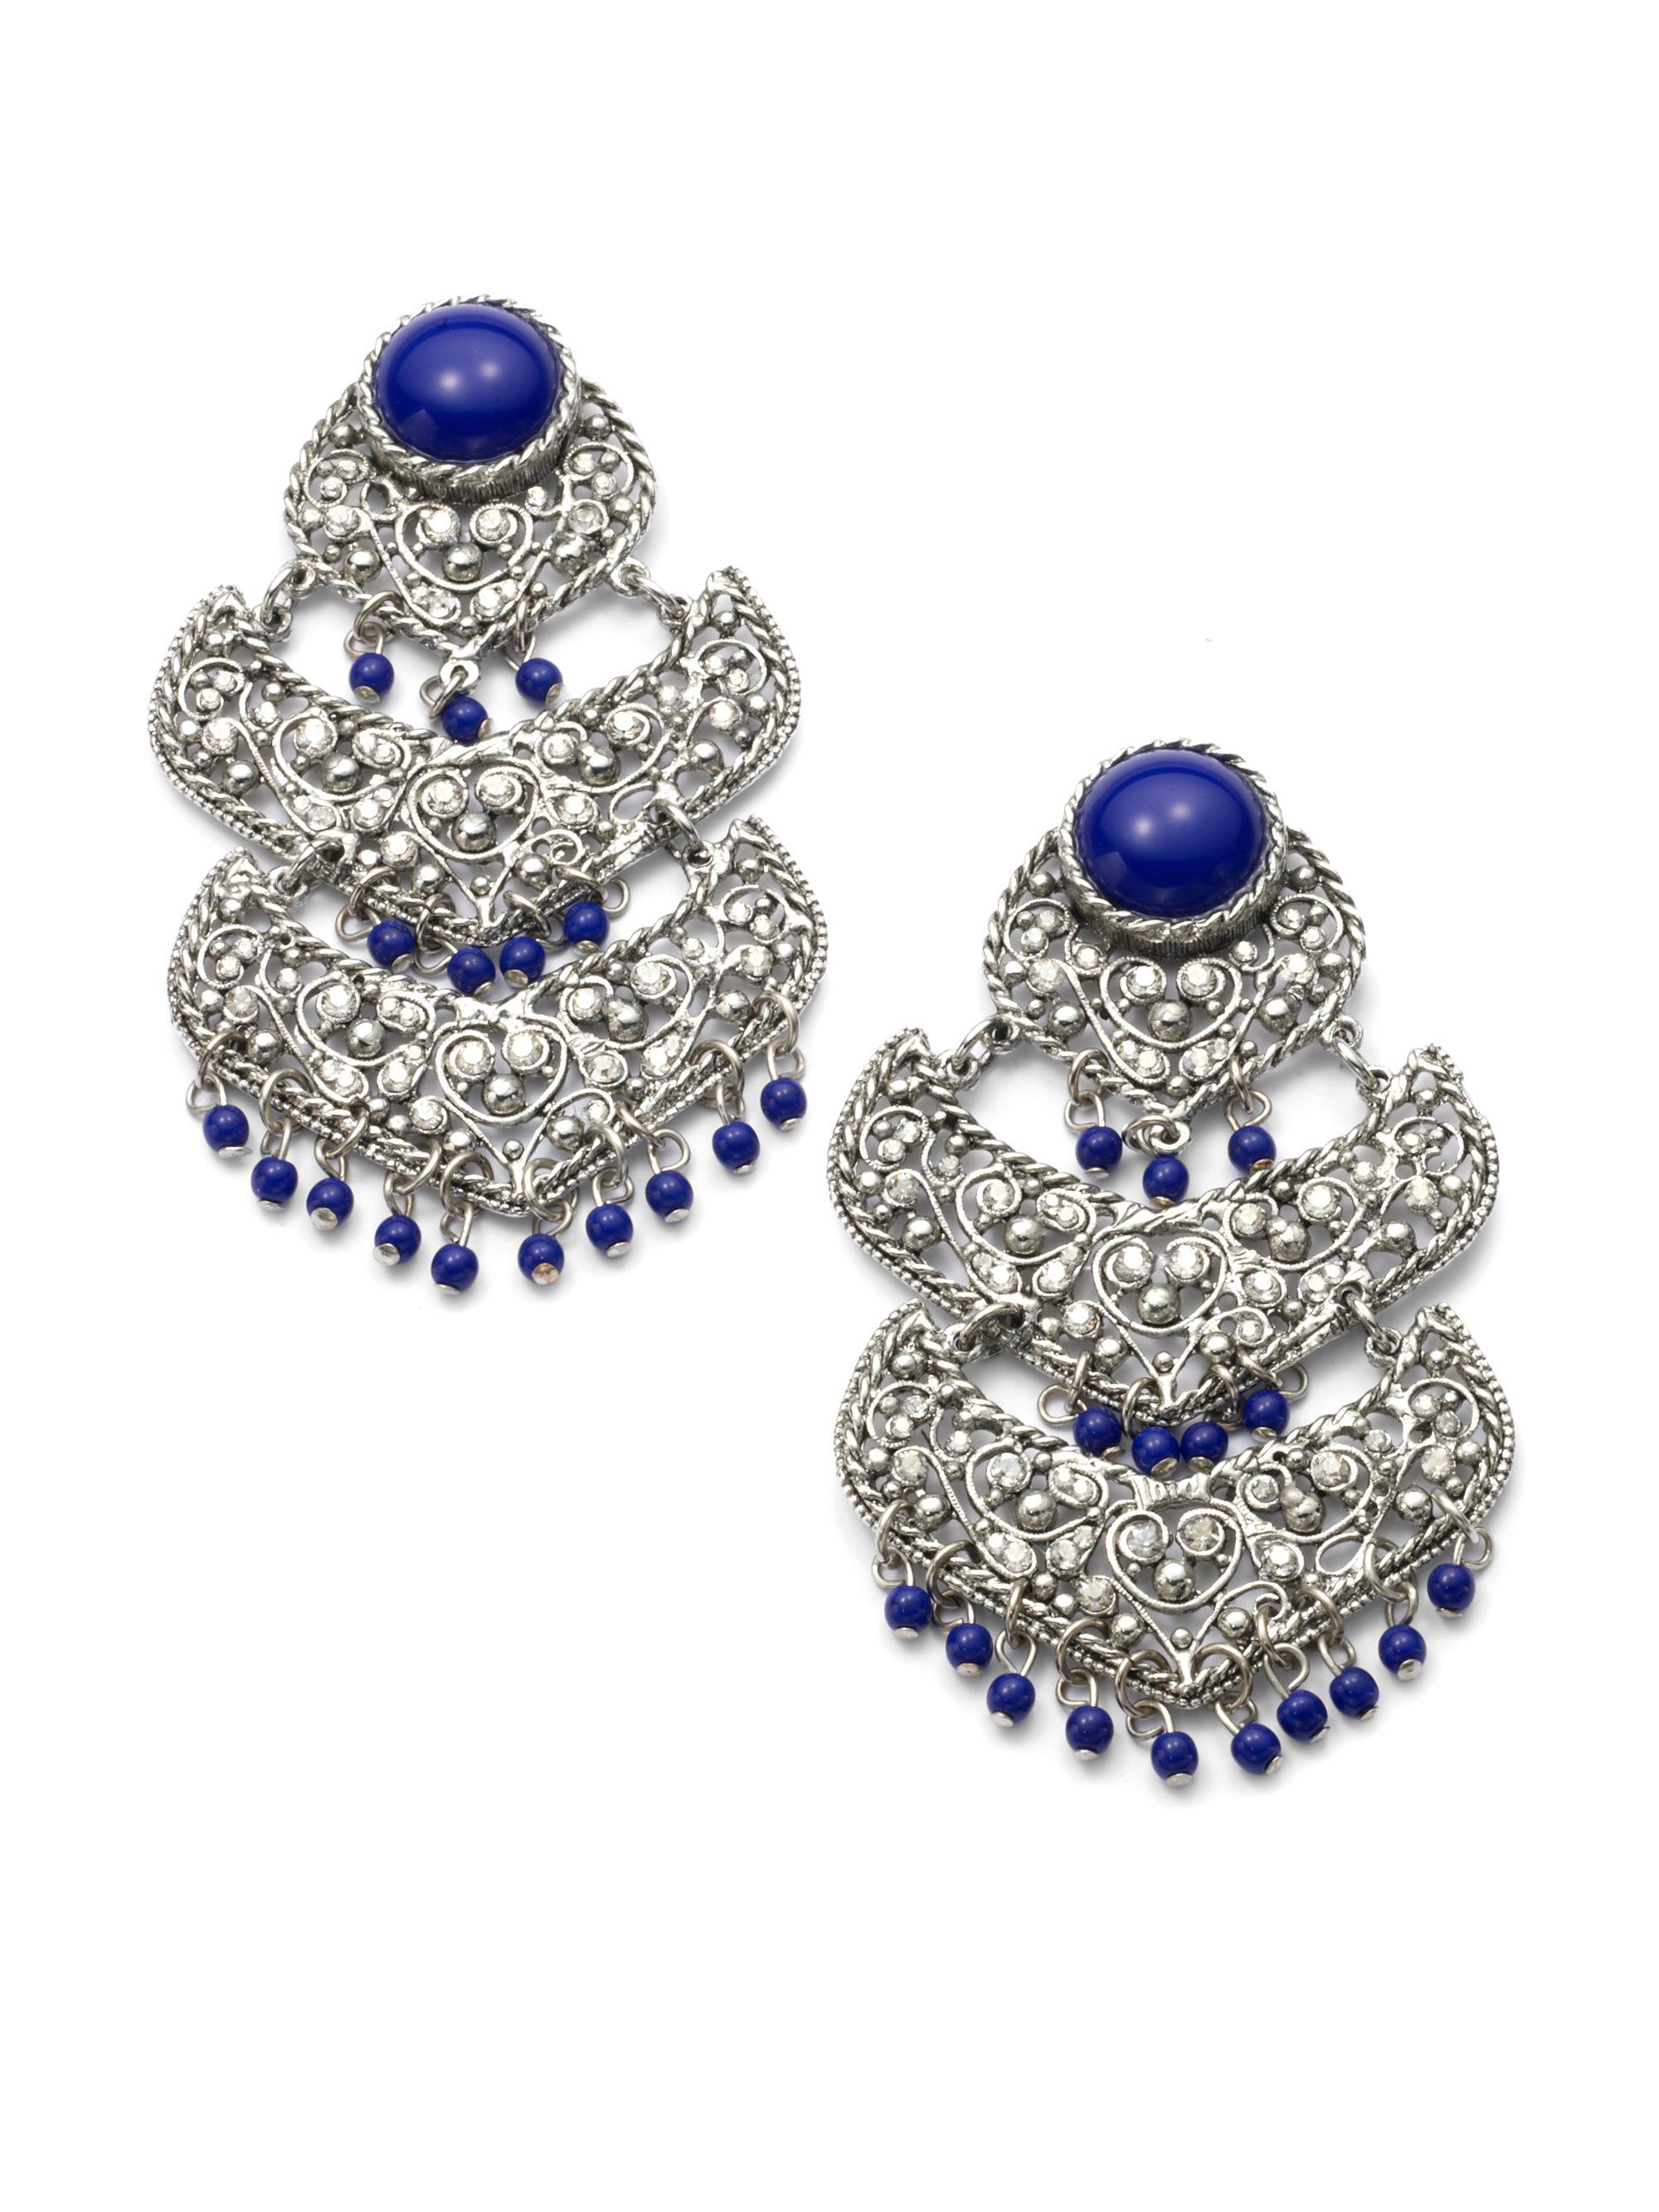 Lyst clara kasavina large filigree chandelier earrings in blue gallery arubaitofo Images